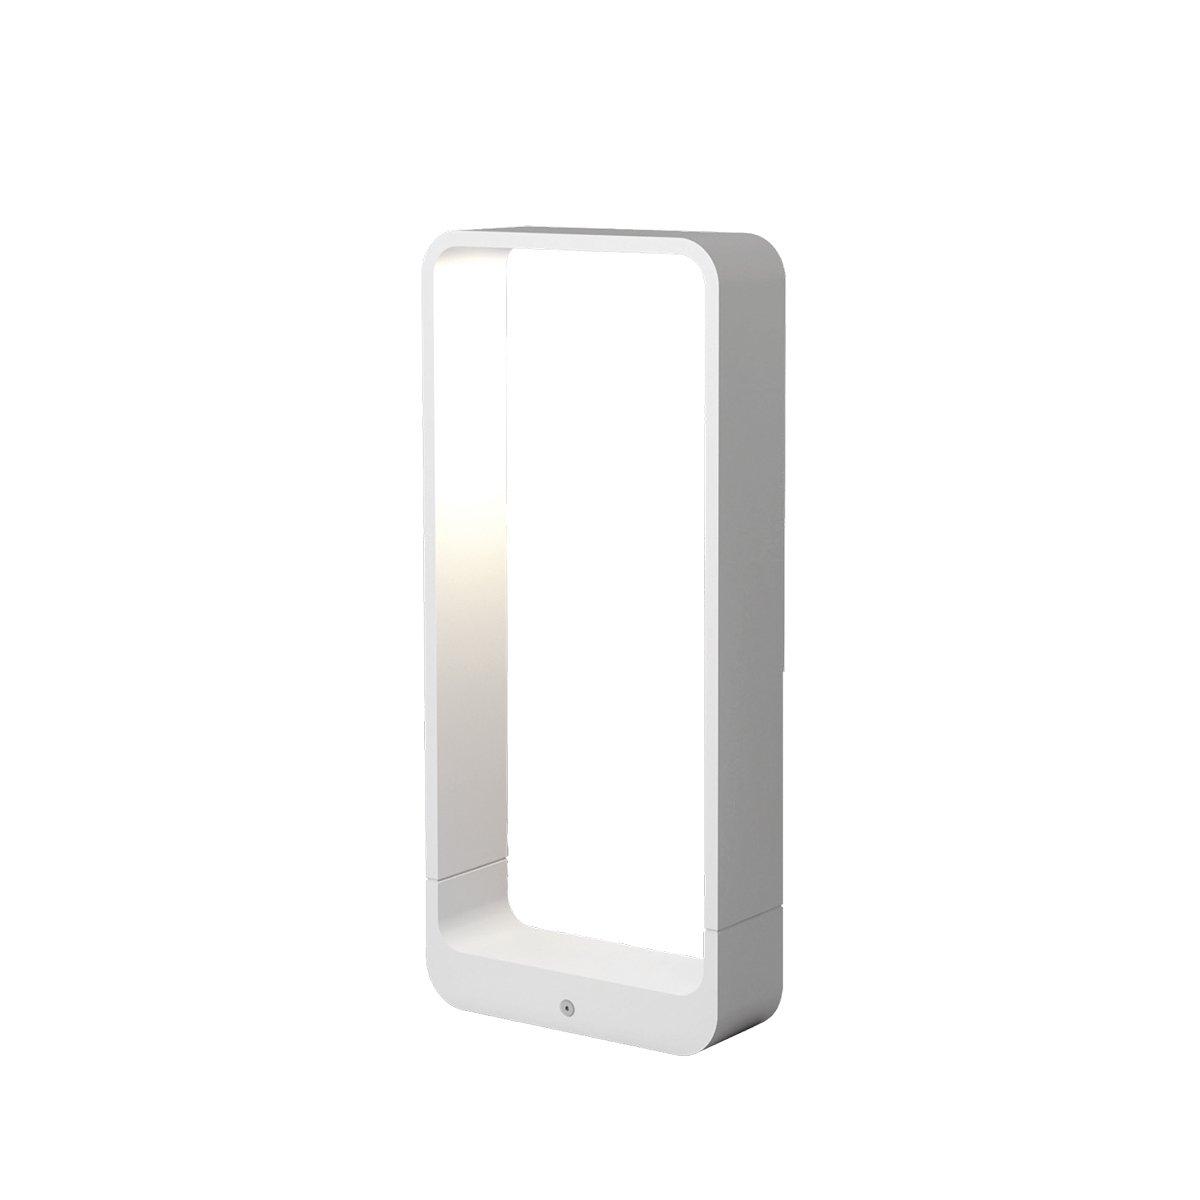 Wever & Ducr� Tape Outdoor Vloerlamp